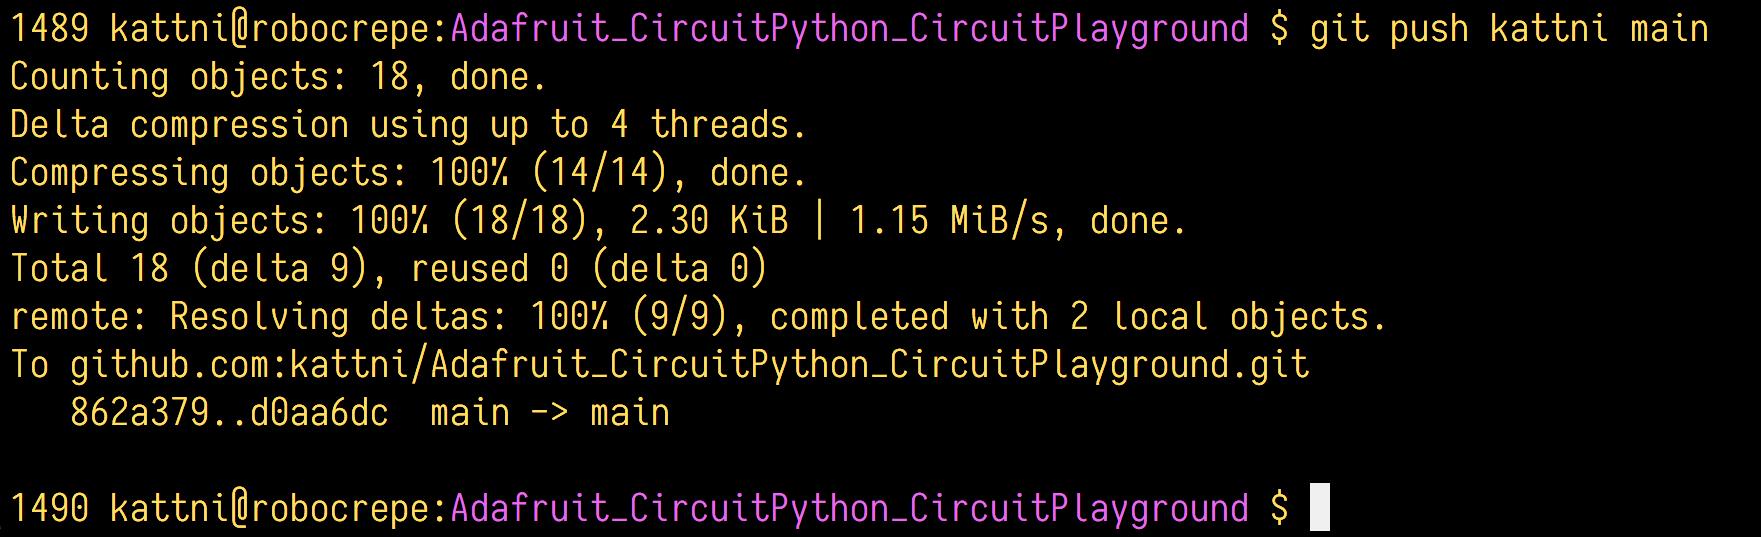 circuitpython_GitUpdatePushMain.png